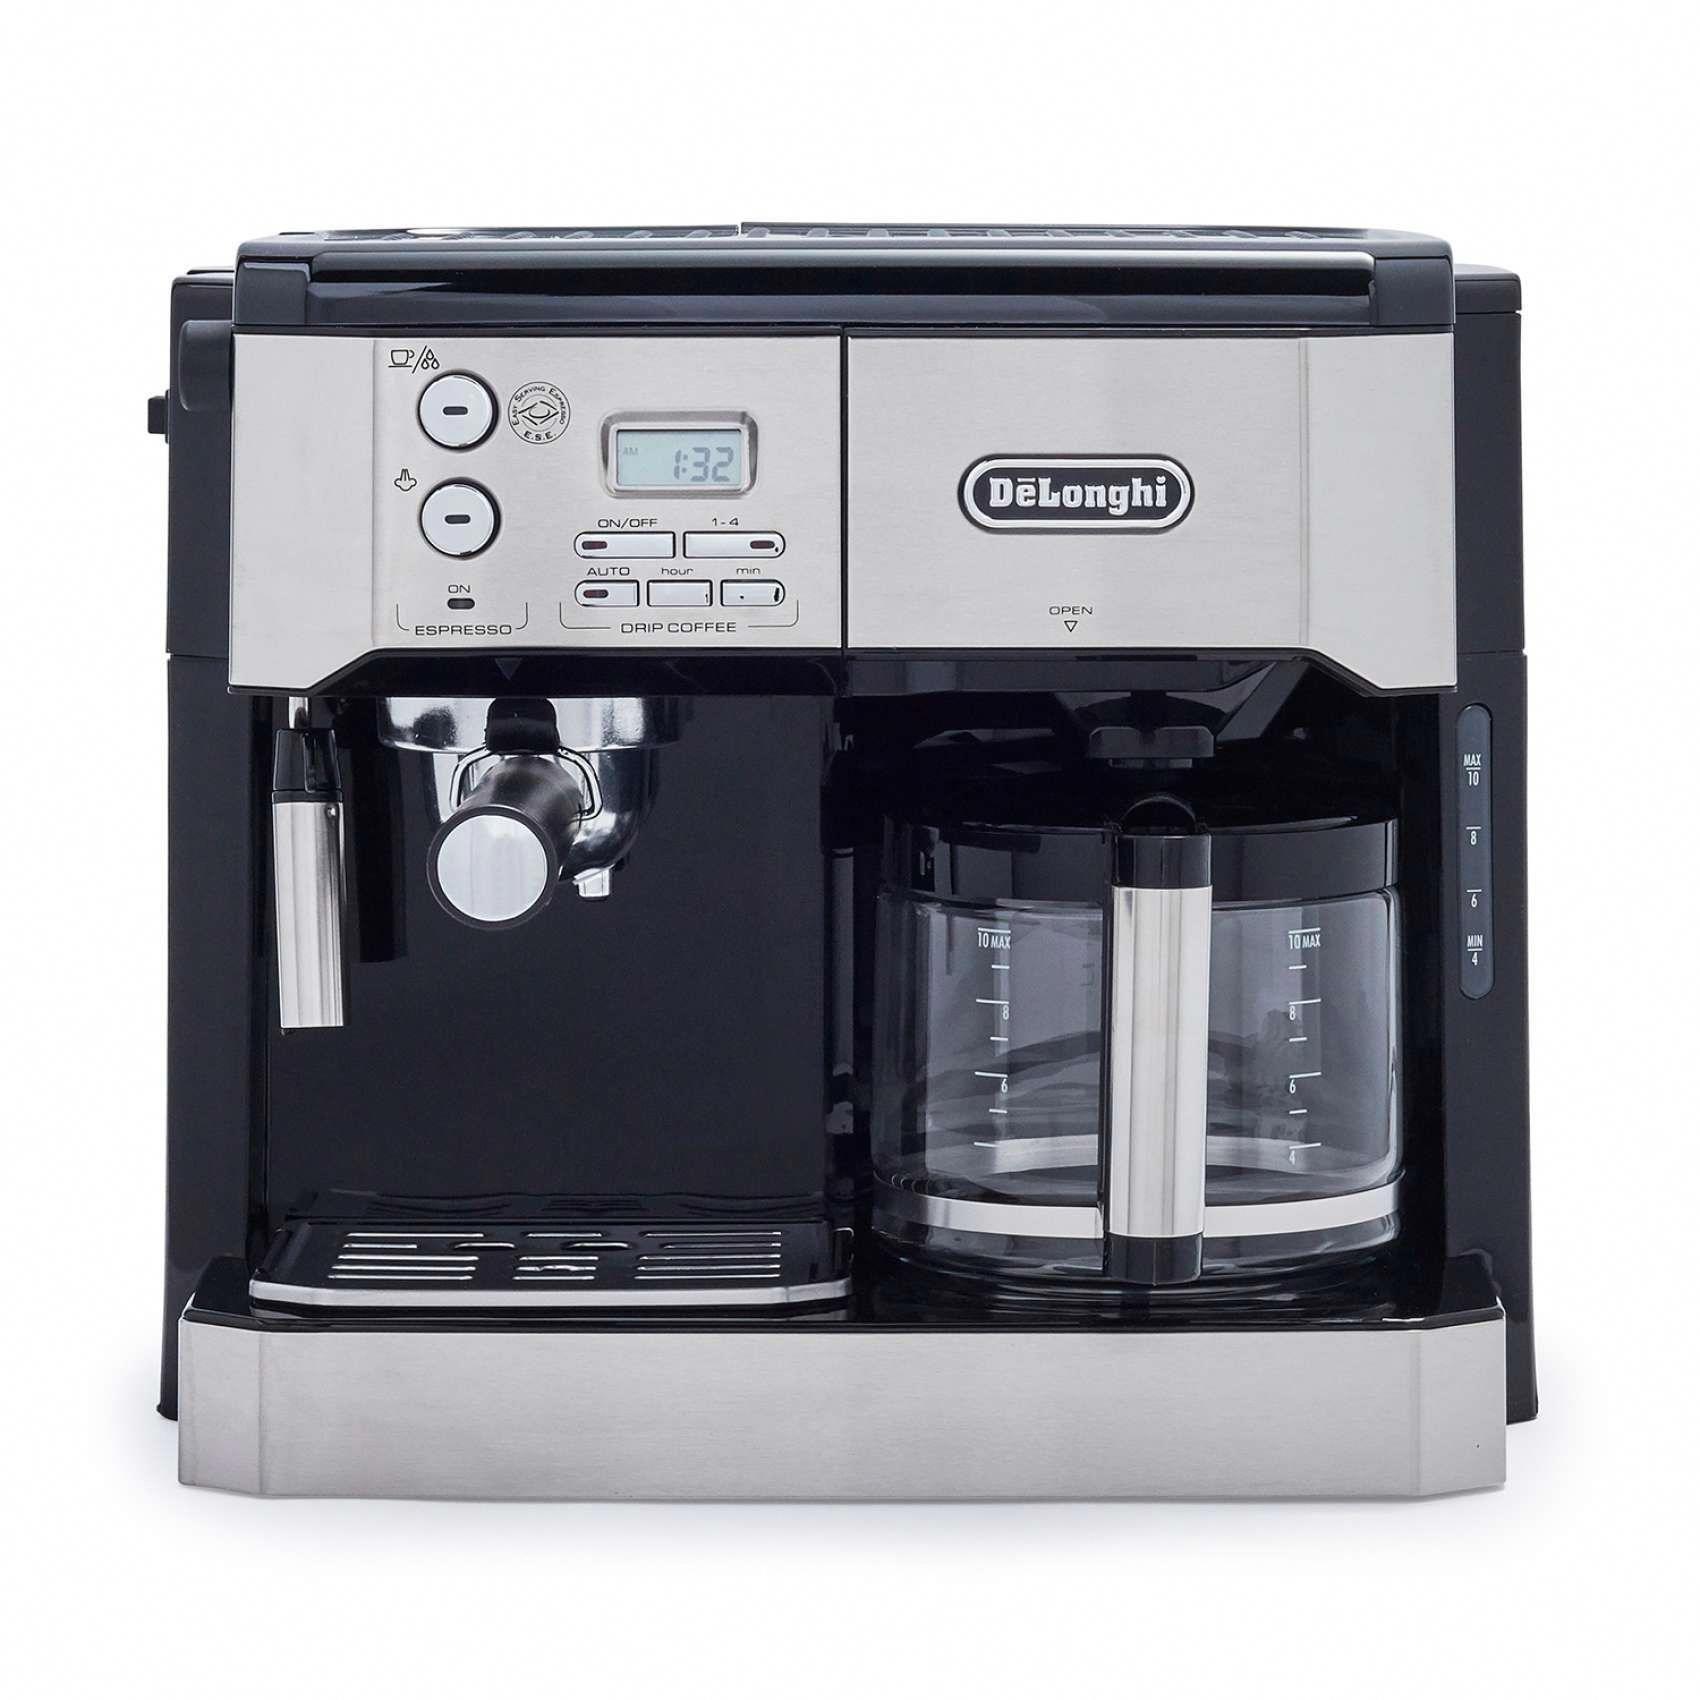 Deulonghi combination pump espresso and cup drip coffee machine